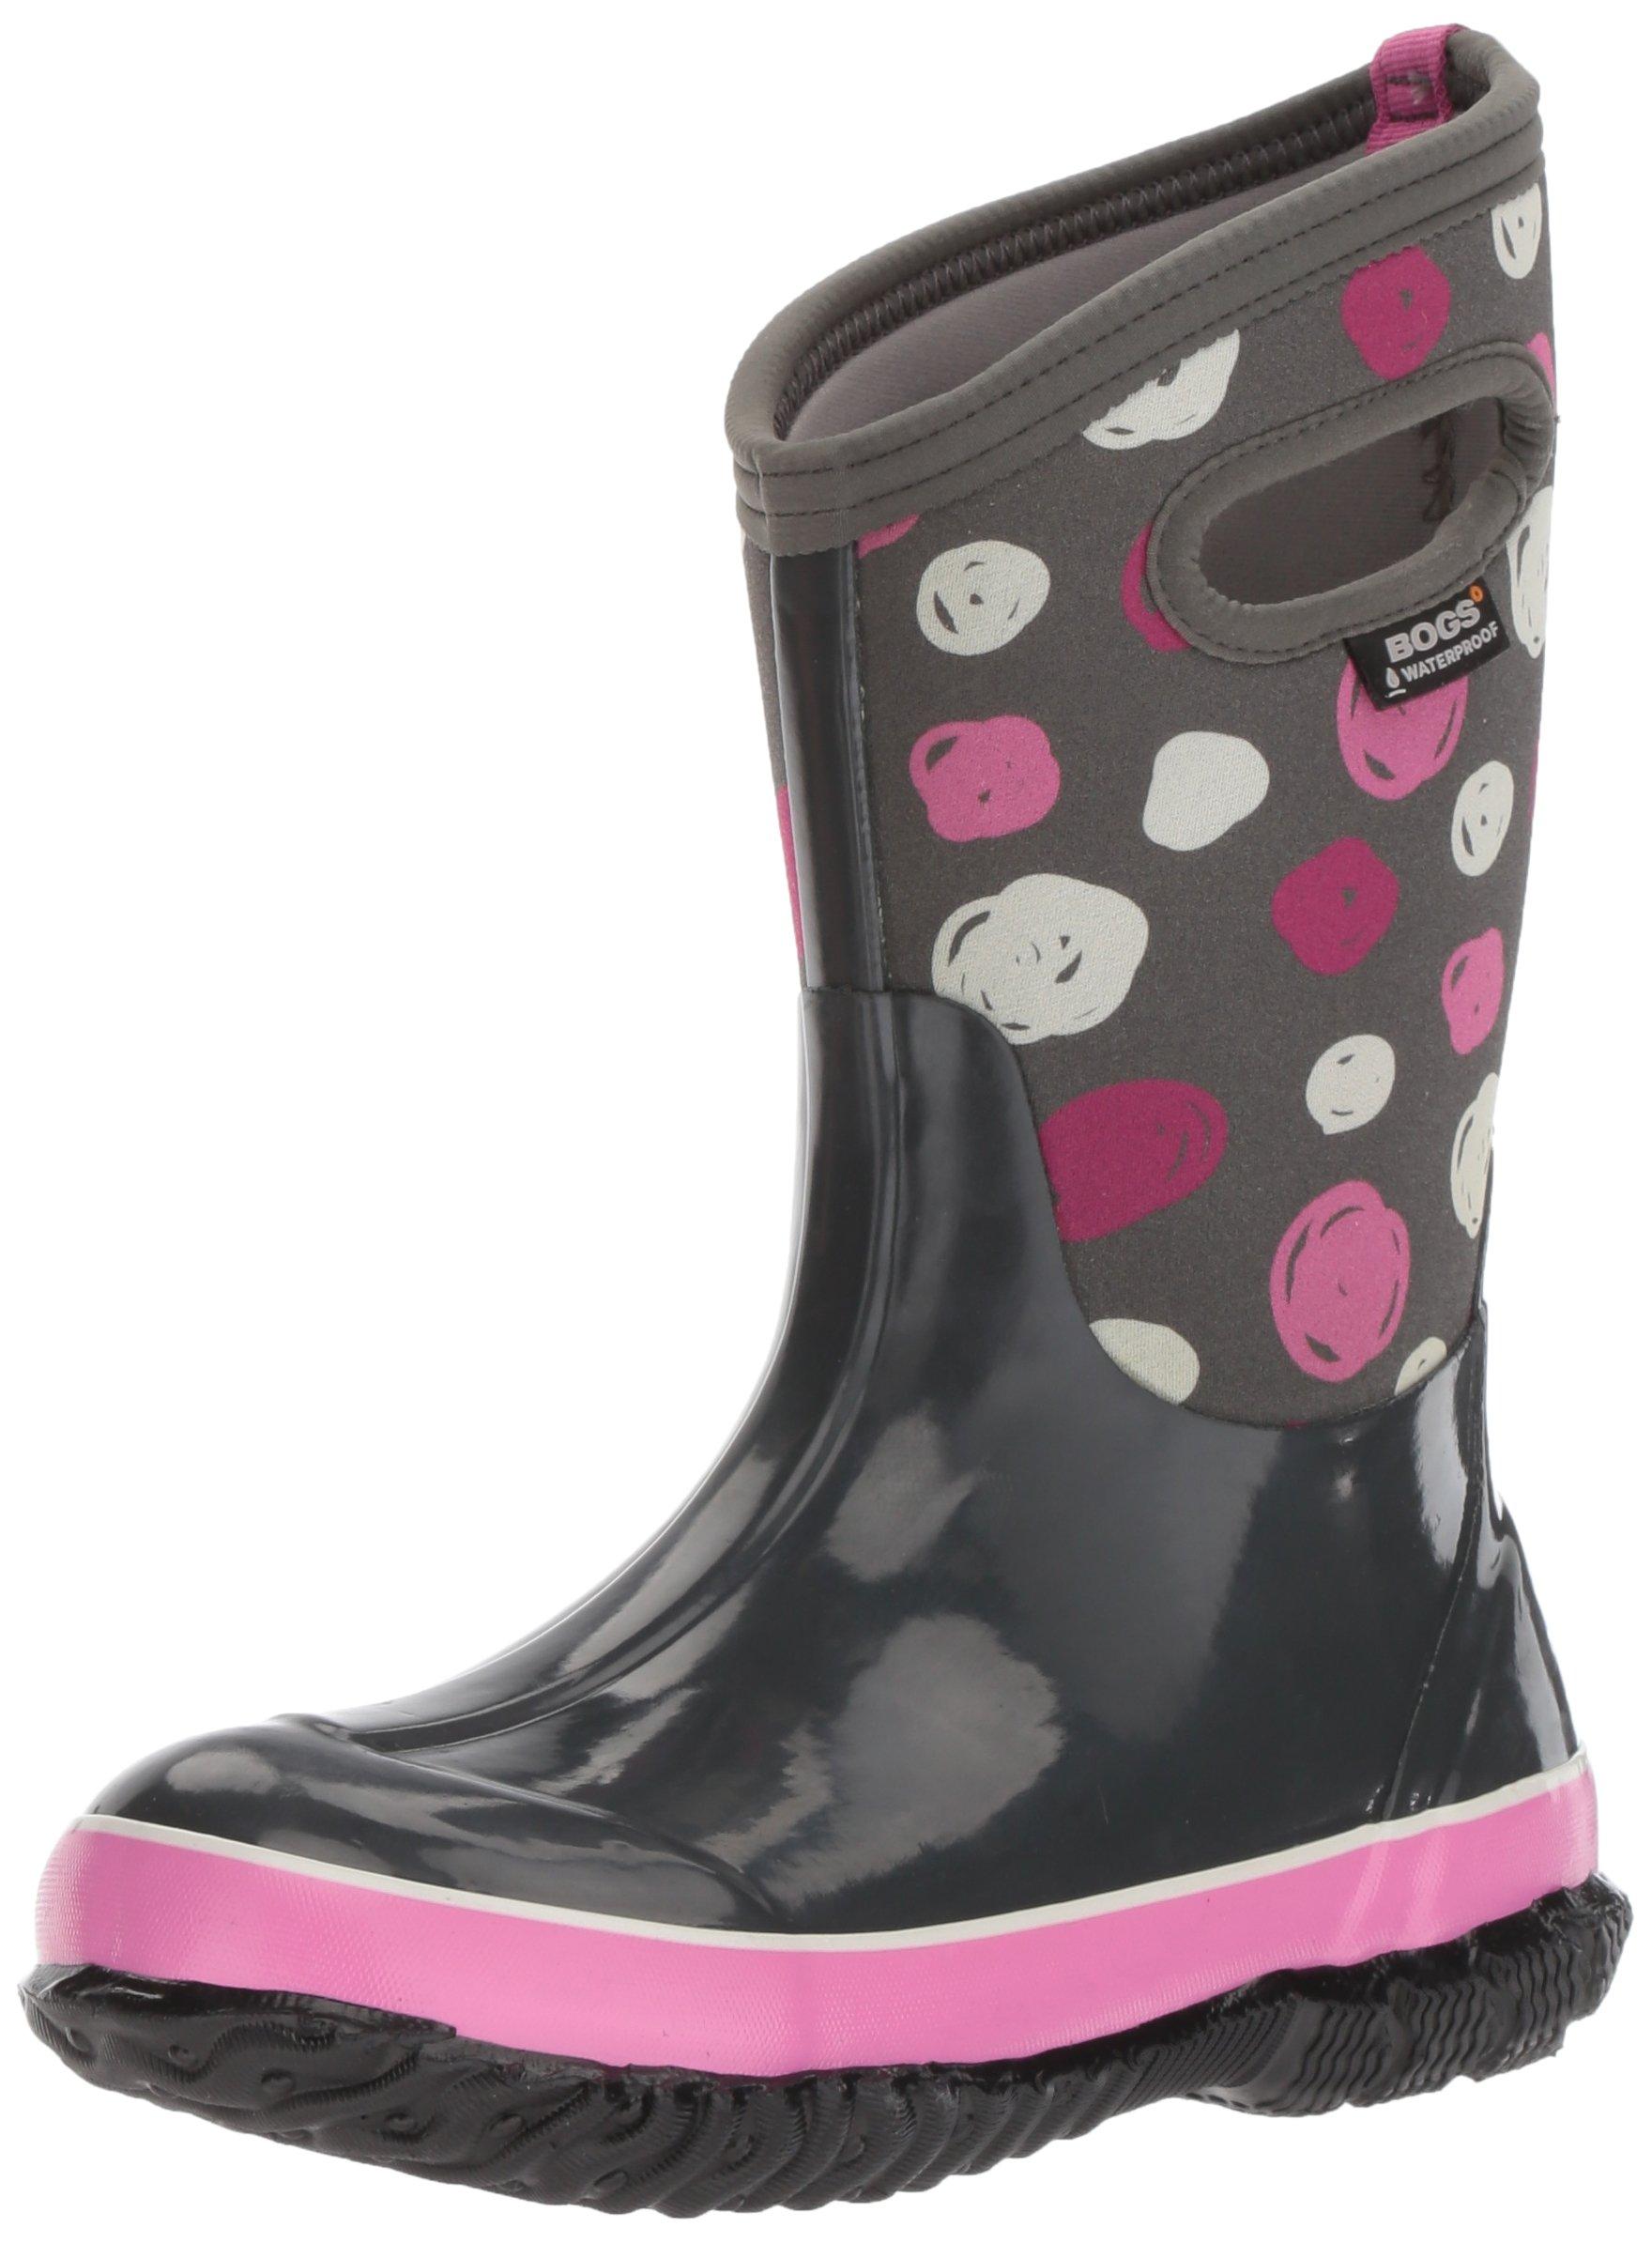 Bogs Classic High Waterproof Insulated Rubber Neoprene Rain Boot Snow, Sketched Dots Print/Dark Gray/Multi, 5 M US Big Kid